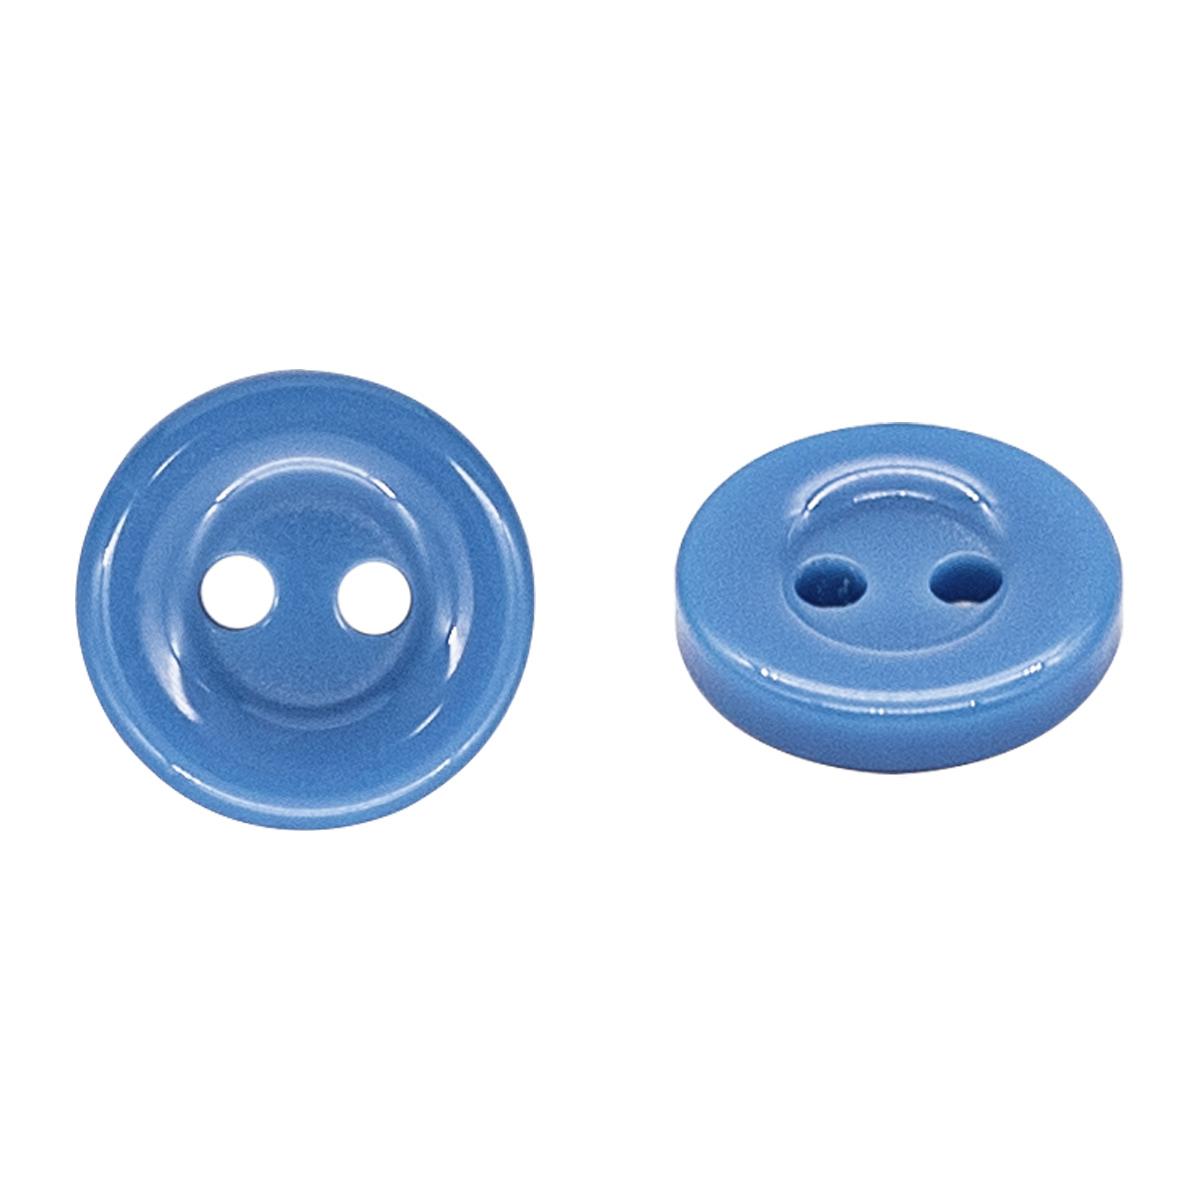 Пуговица на прокол 18L, цв. голубой, 15 шт/упак